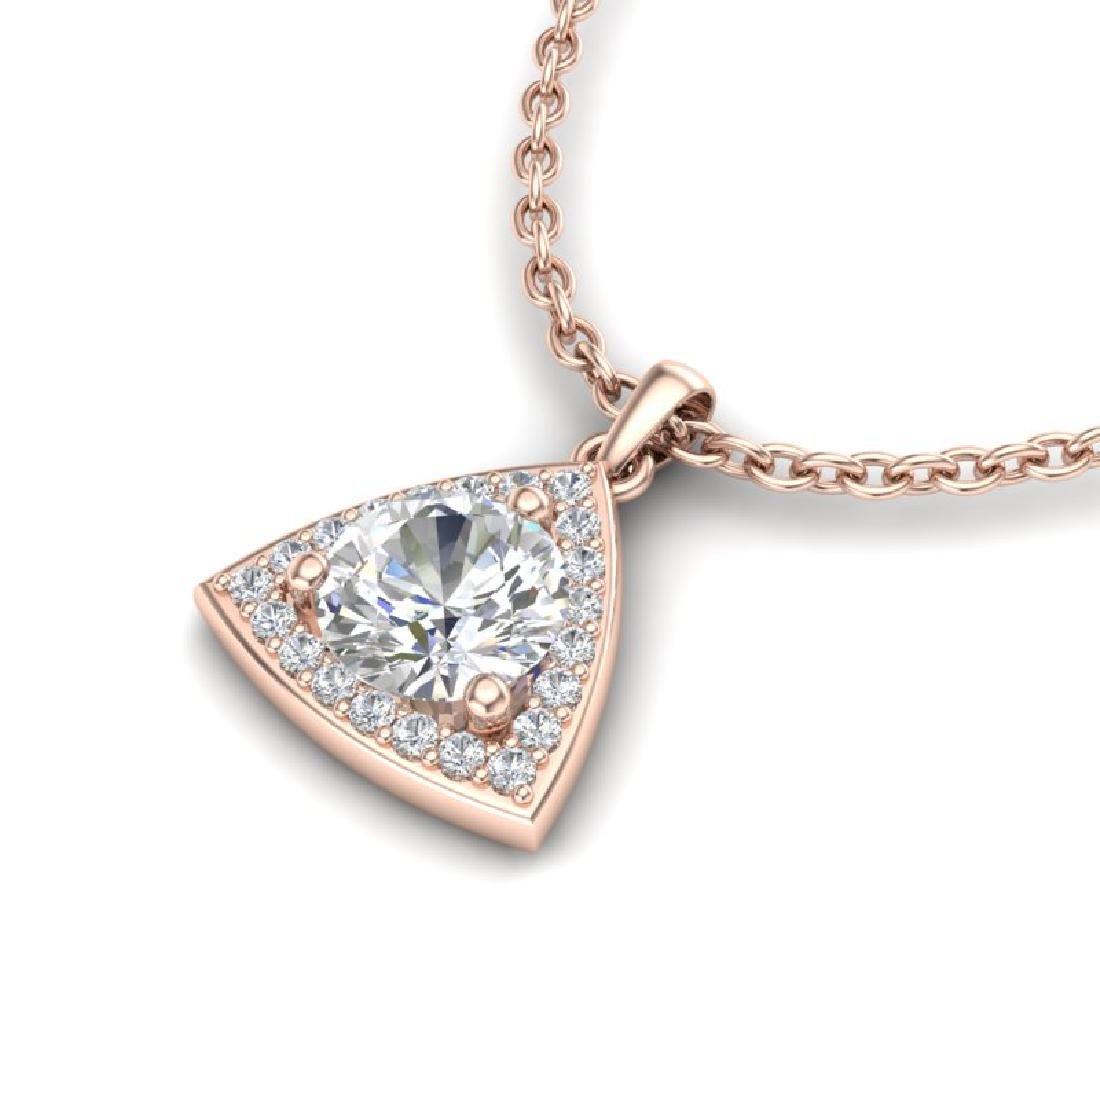 1.50 CTW VS/SI Diamond Necklace 14K Rose Gold - 2